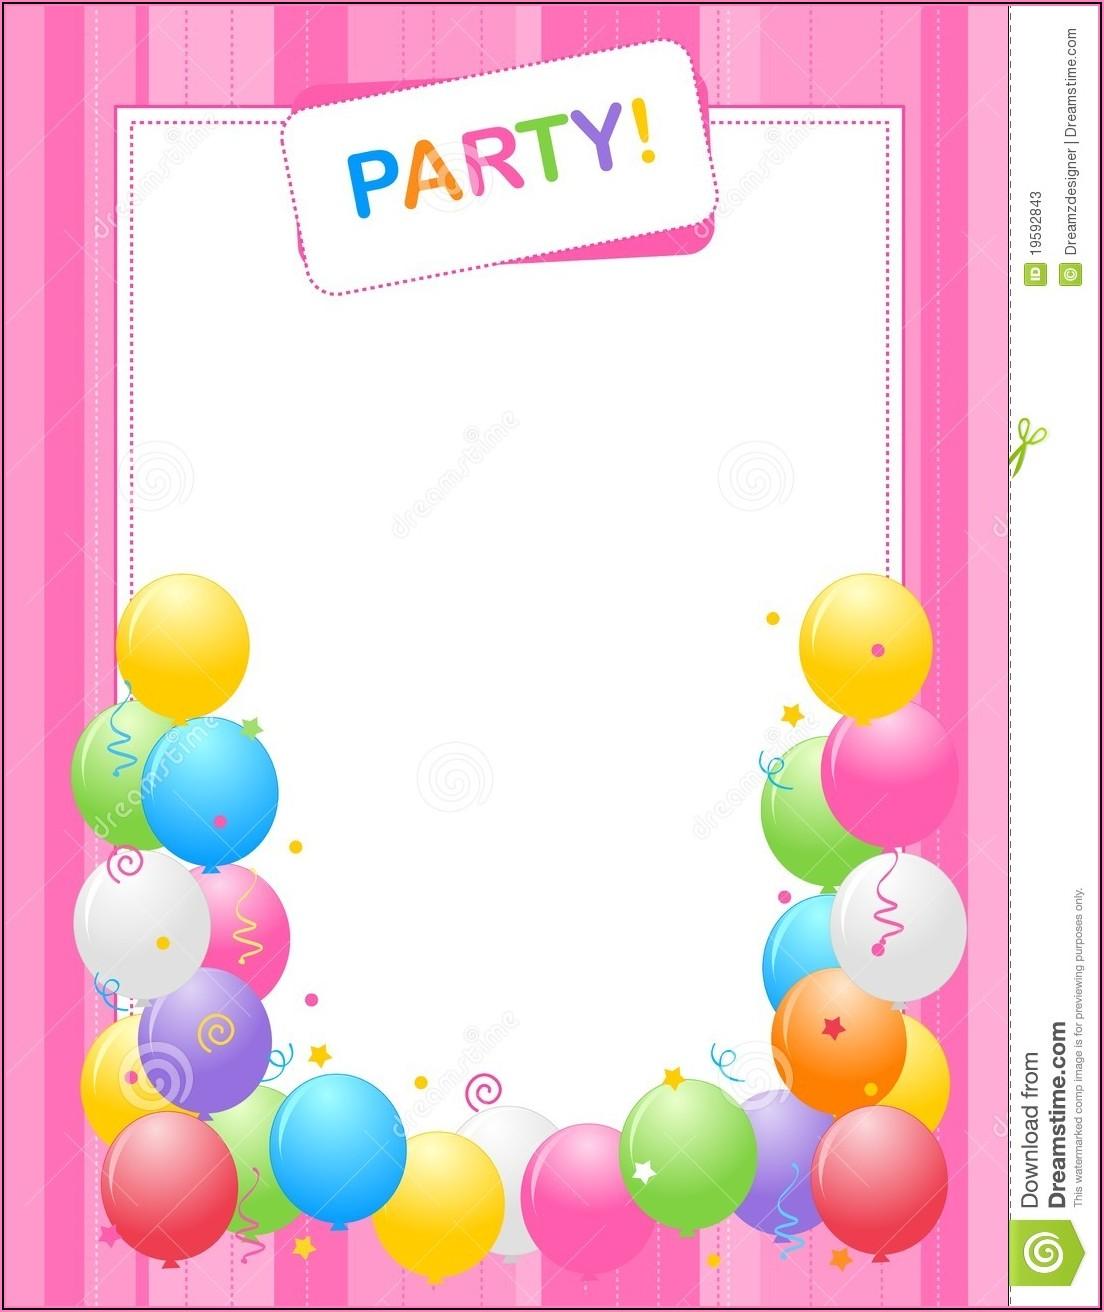 Birthday Invitation Background Pictures